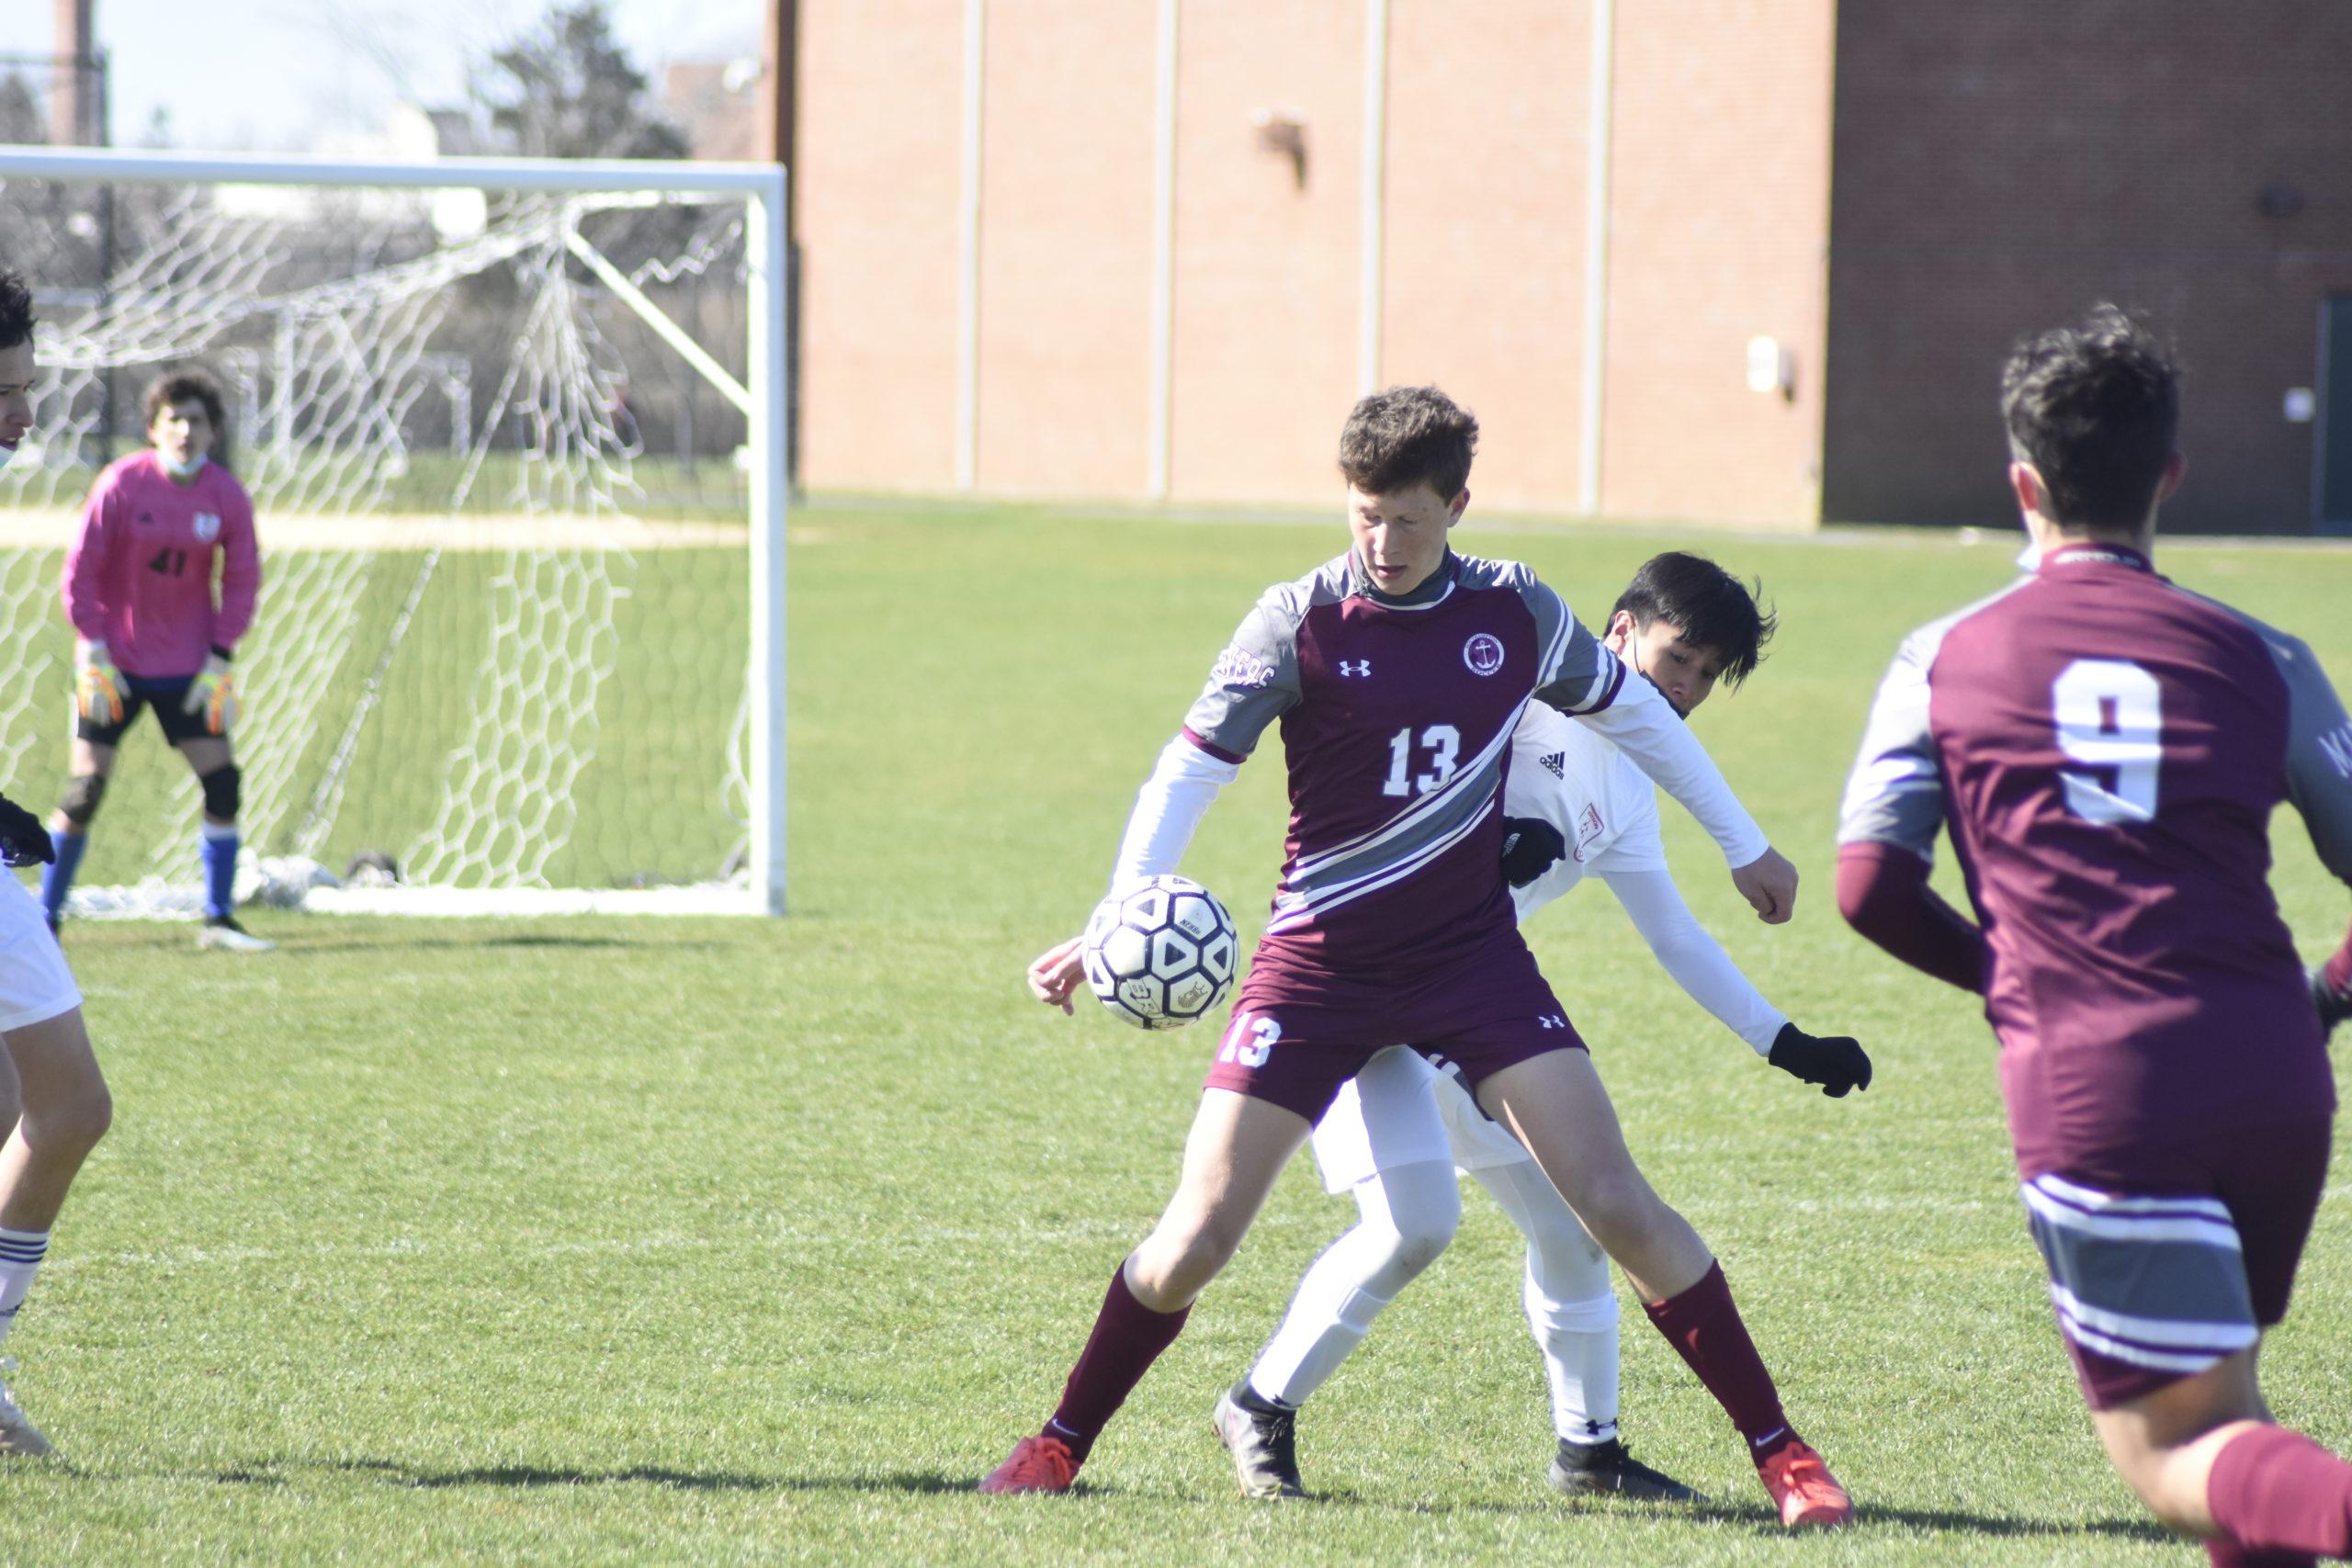 The ball touches Southampton senior Griffin Schwartz's hand for inadvertent handball.